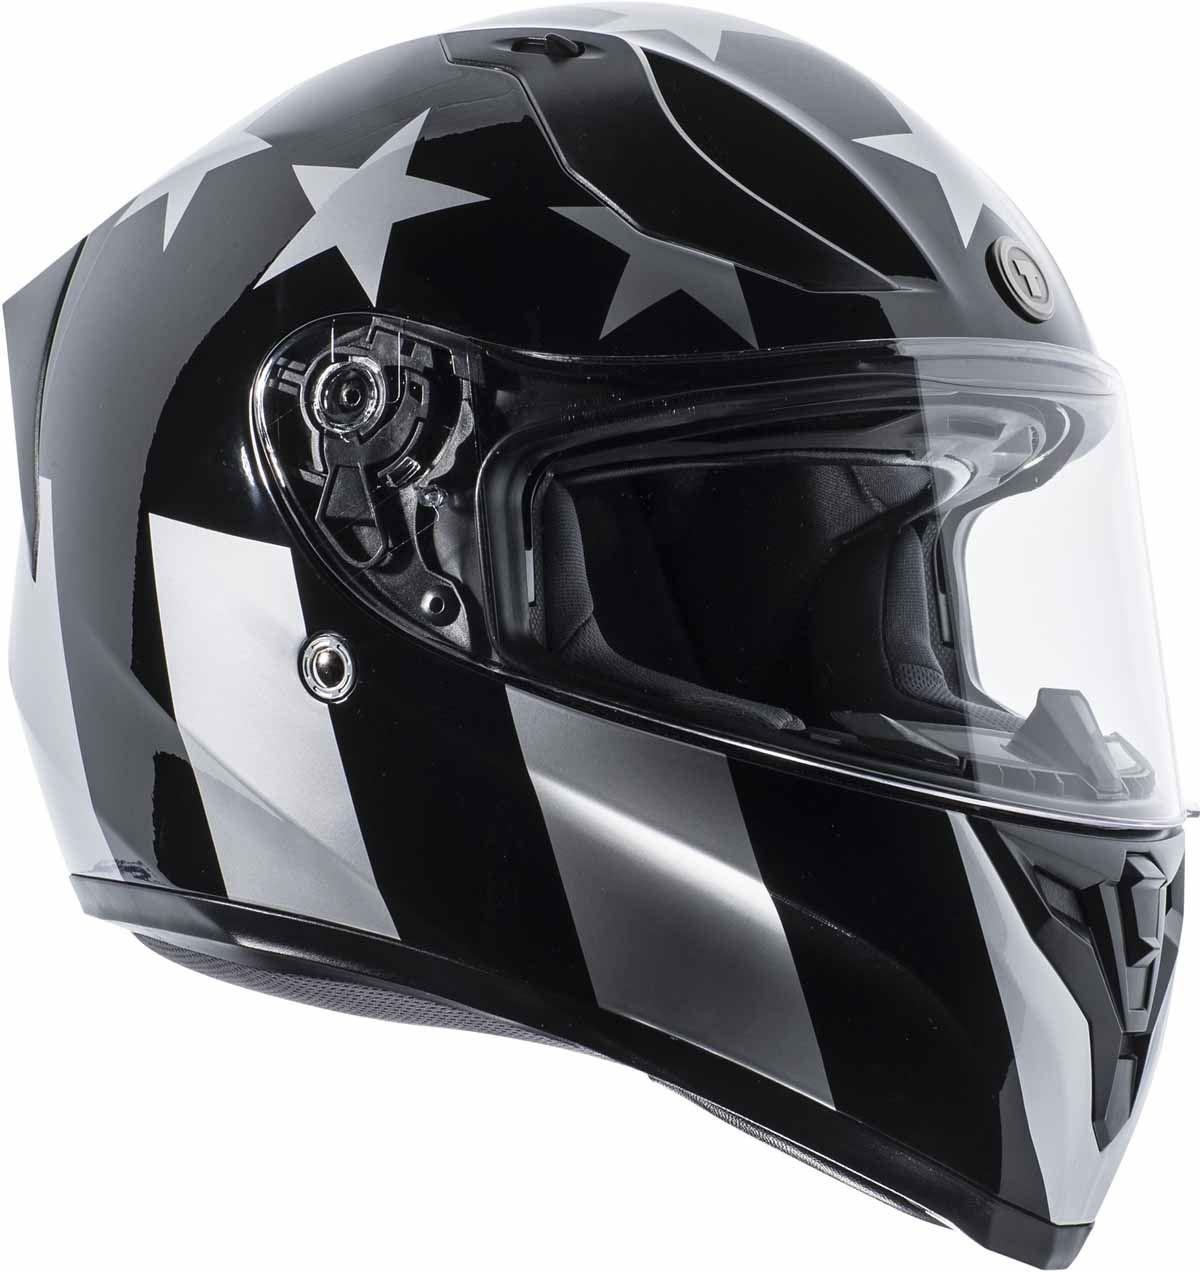 miniature 9 - Torc T15 T15B Helmet Bluetooth Blinc or without - Inner Sun Shield DOT XS-2XL